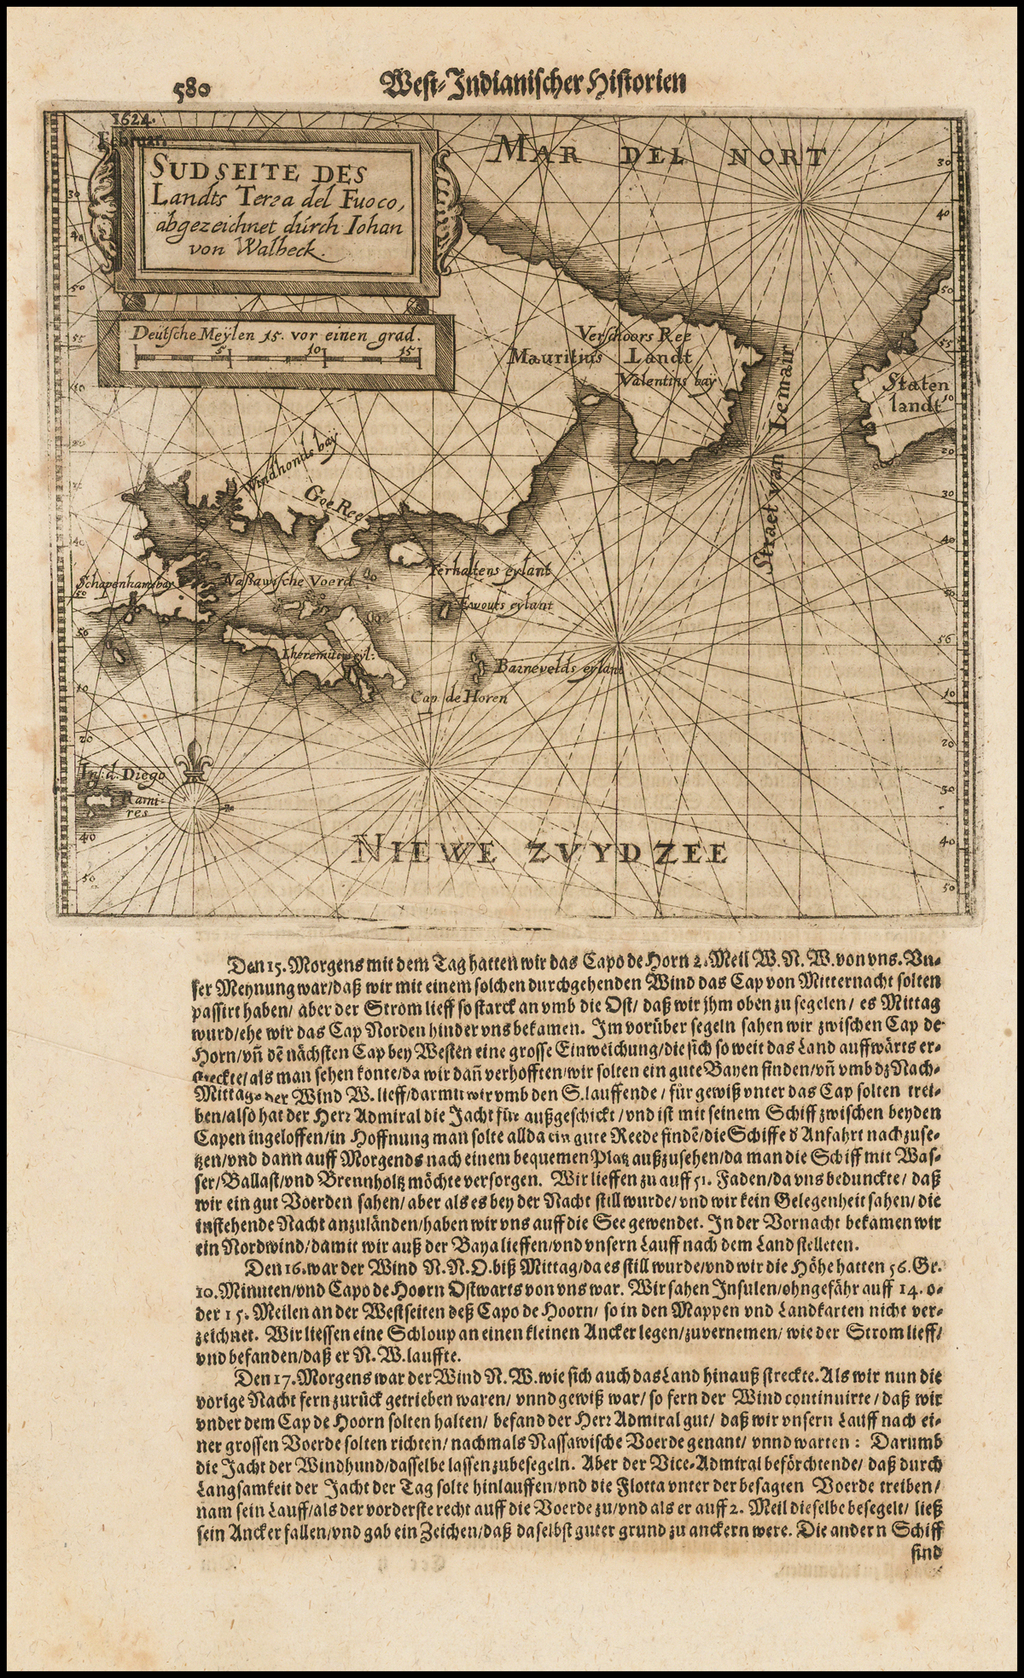 Sud Seite Des Landts Terza del Fuoco, abgezeichn et durch Iohan von Walbeck By Theodor De Bry